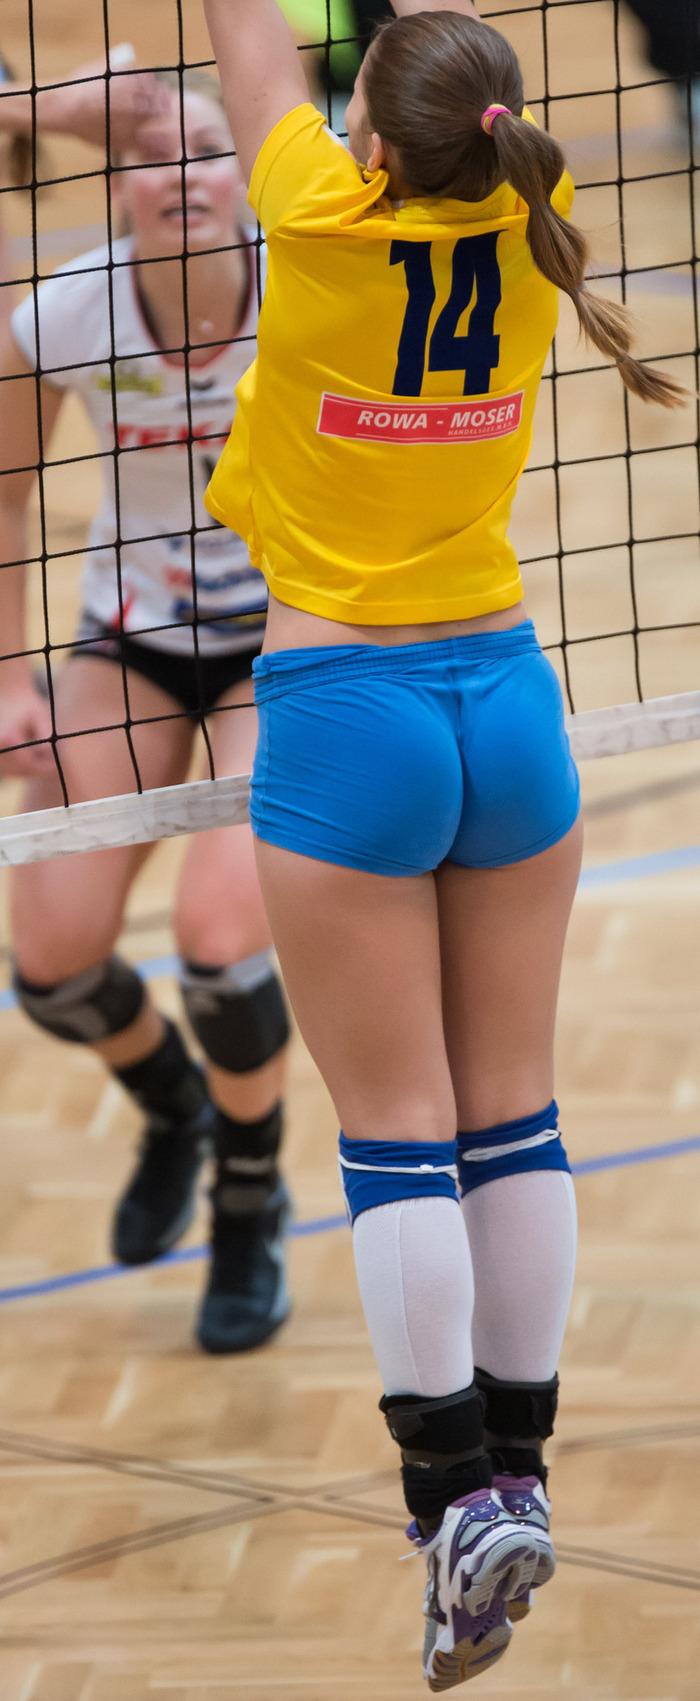 Волейболистка